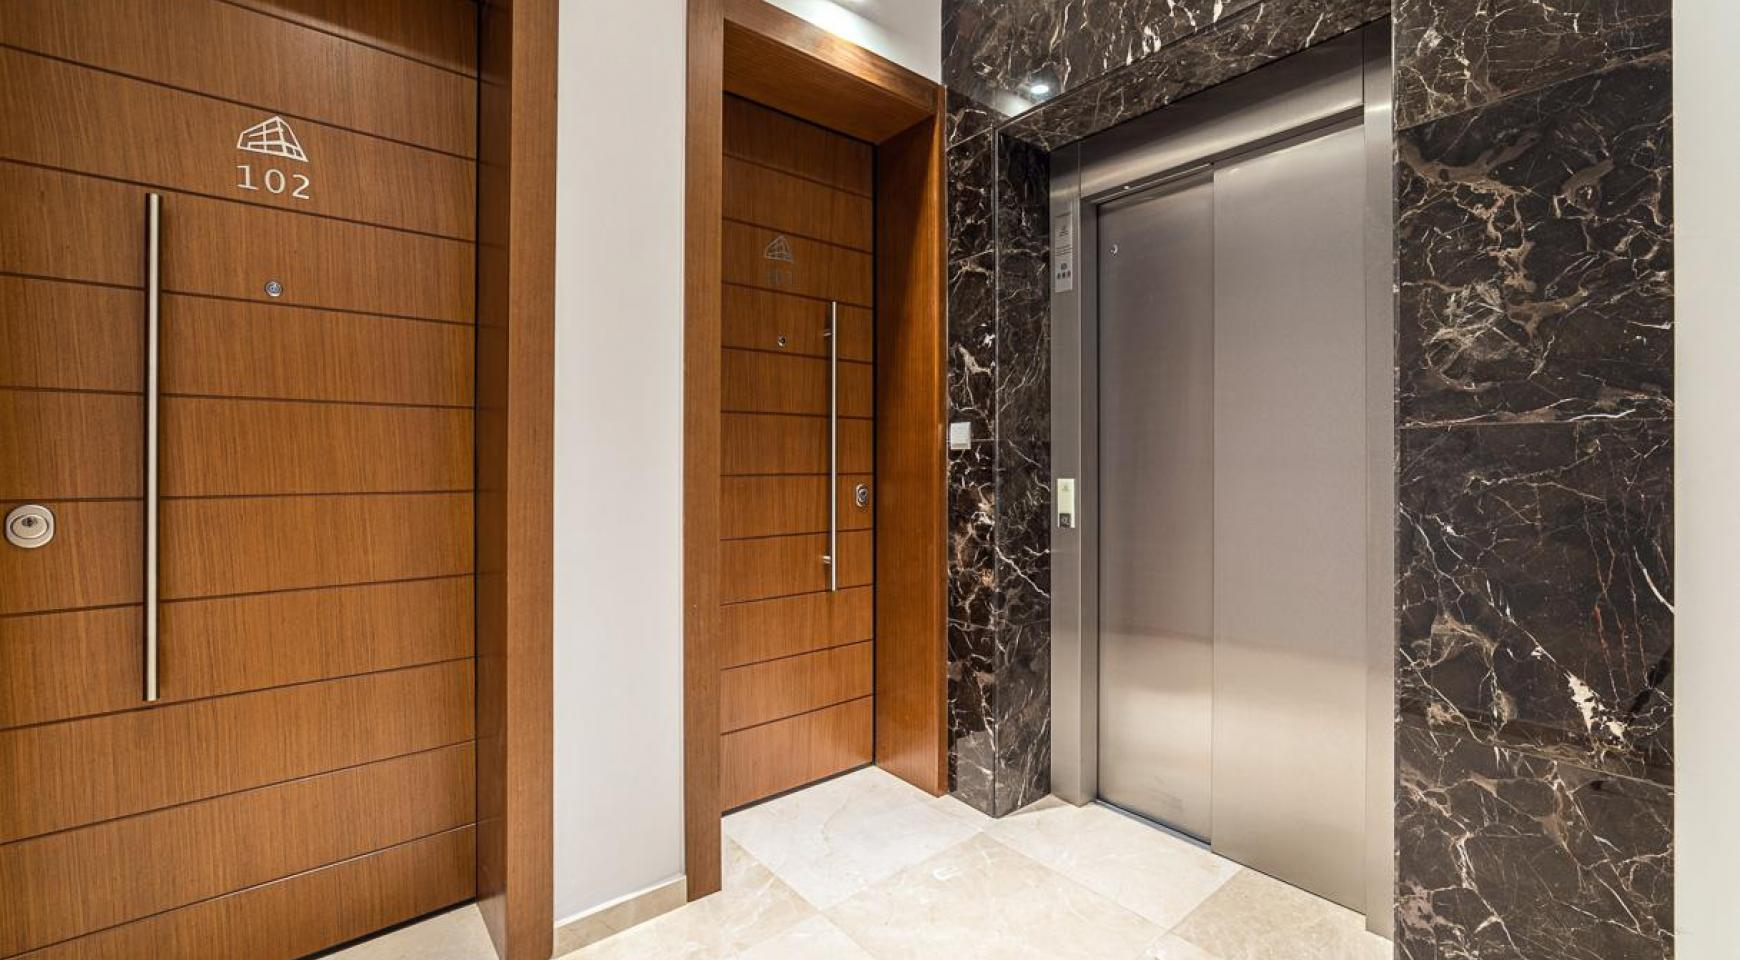 Malibu Residence. Modern One Bedroom Apartment 101 in Potamos Germasogeia - 18